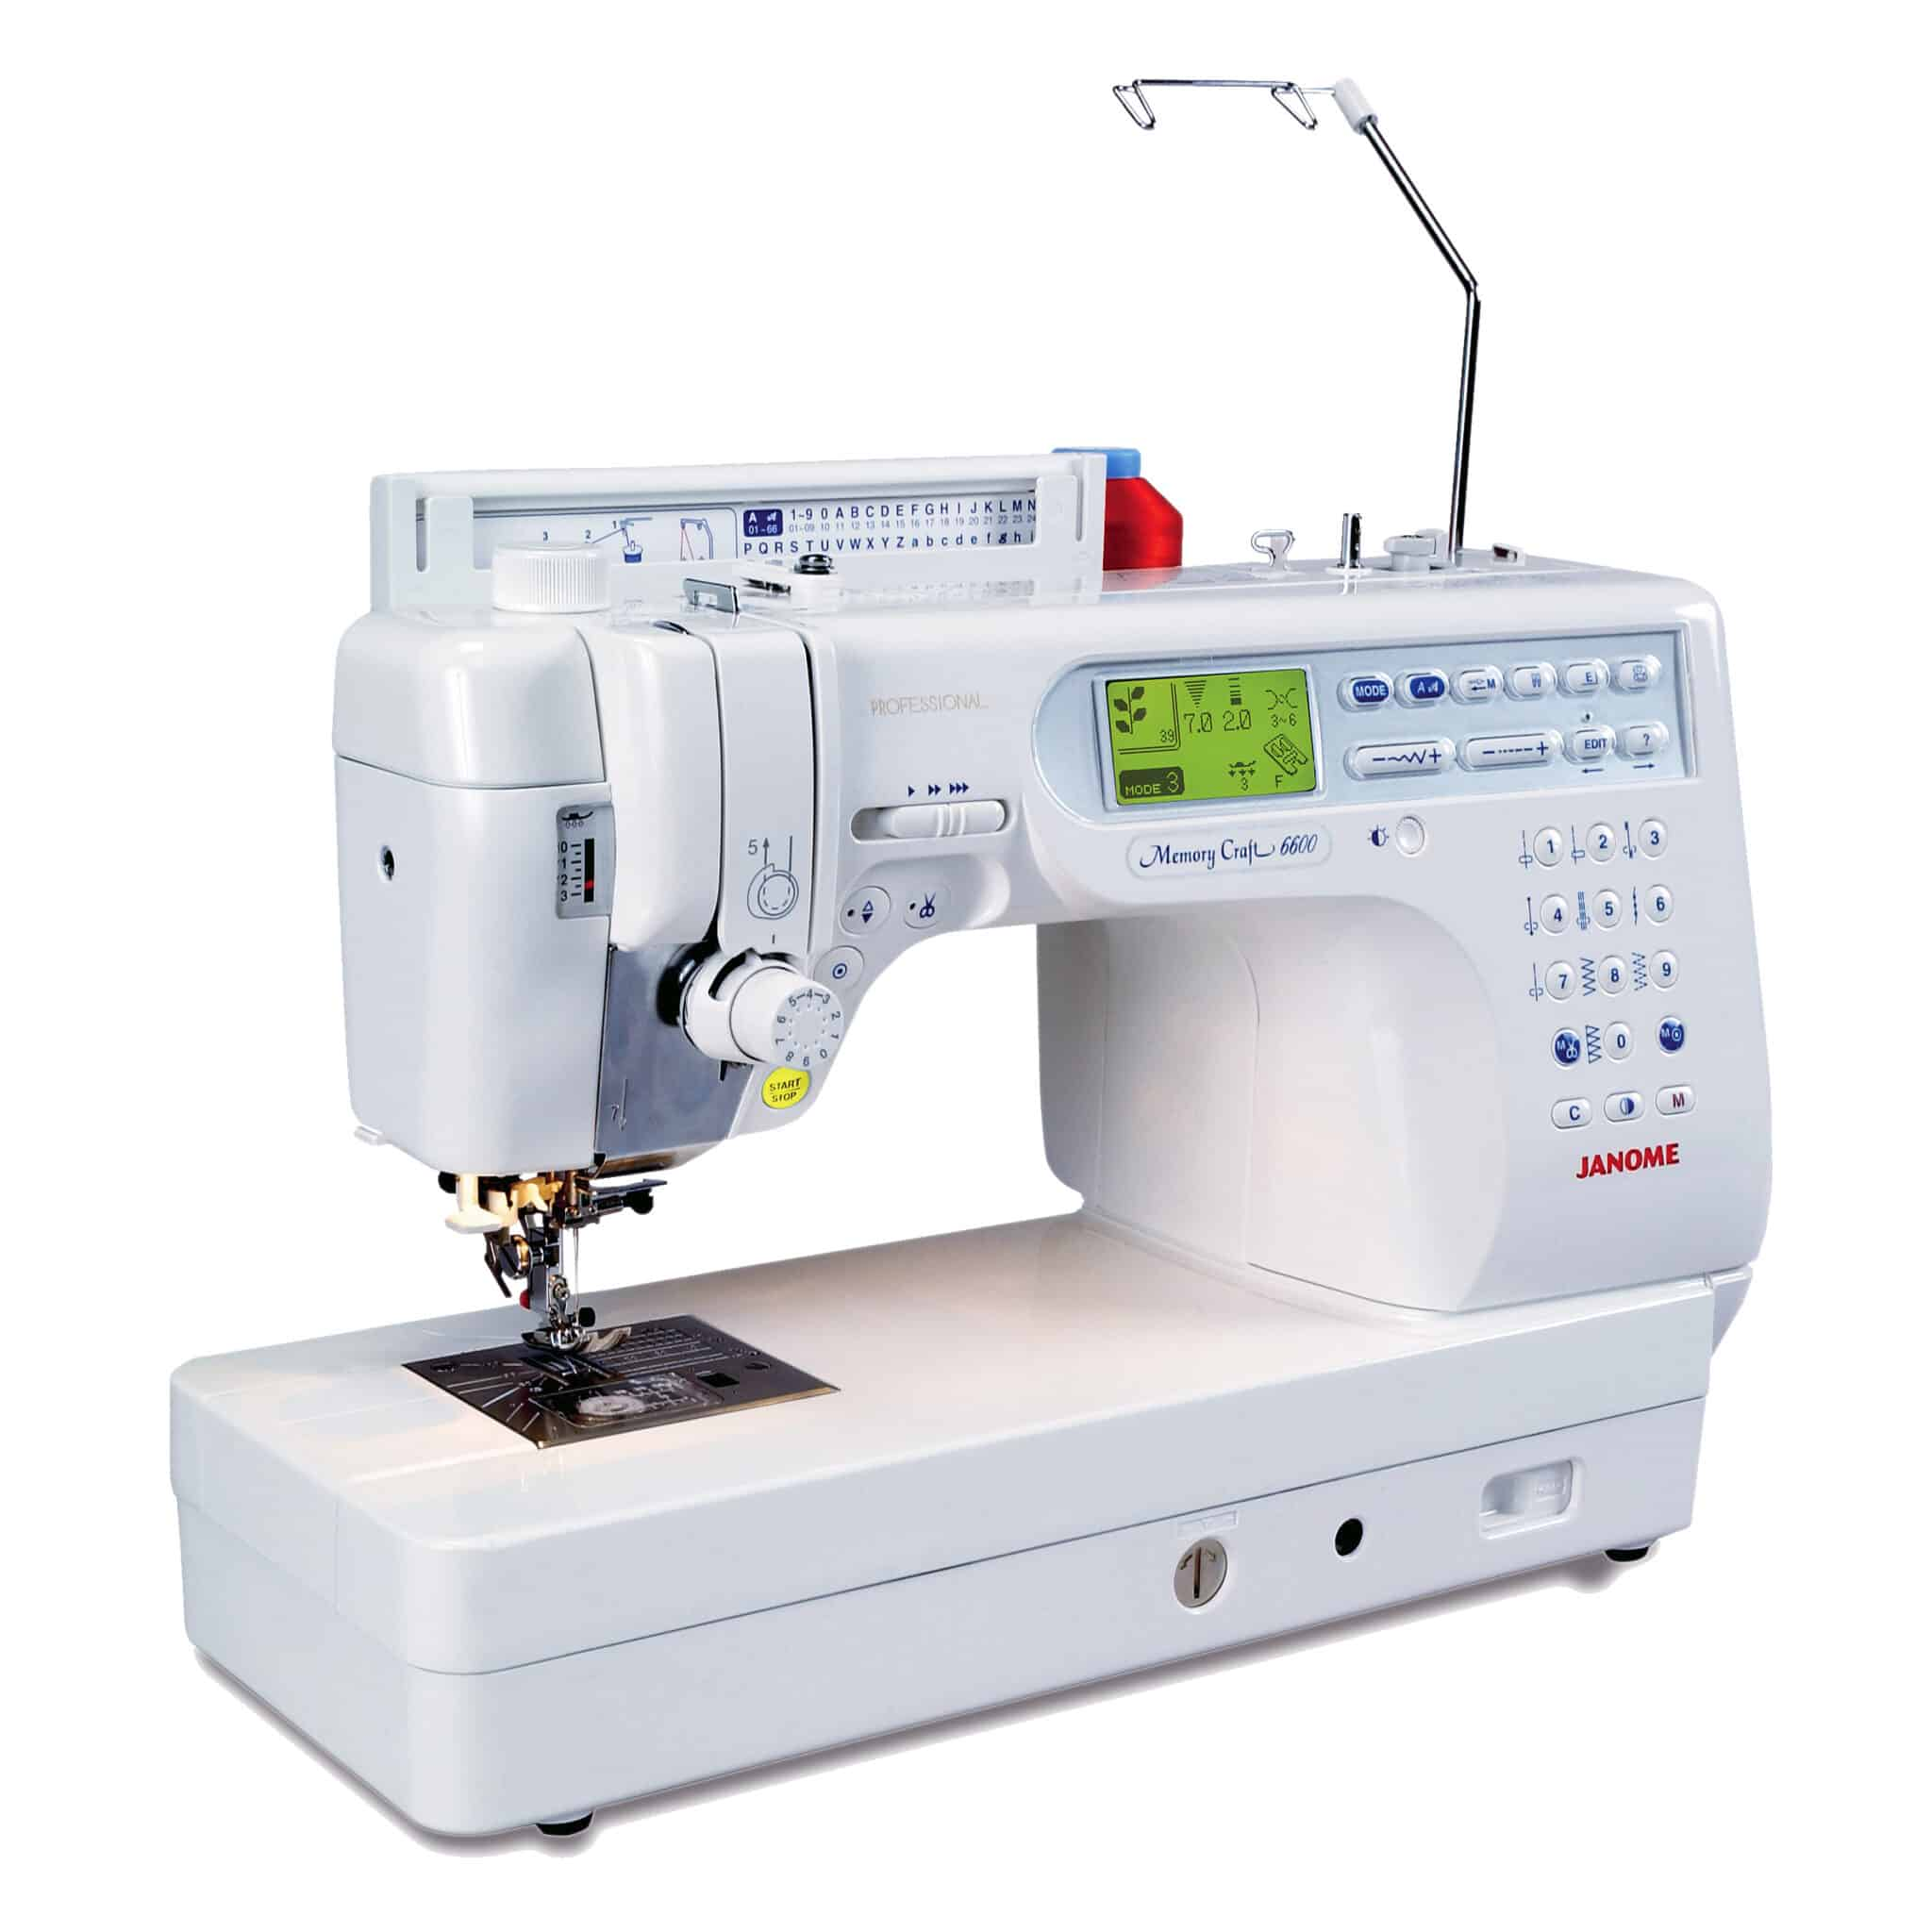 Janome-MC-600P